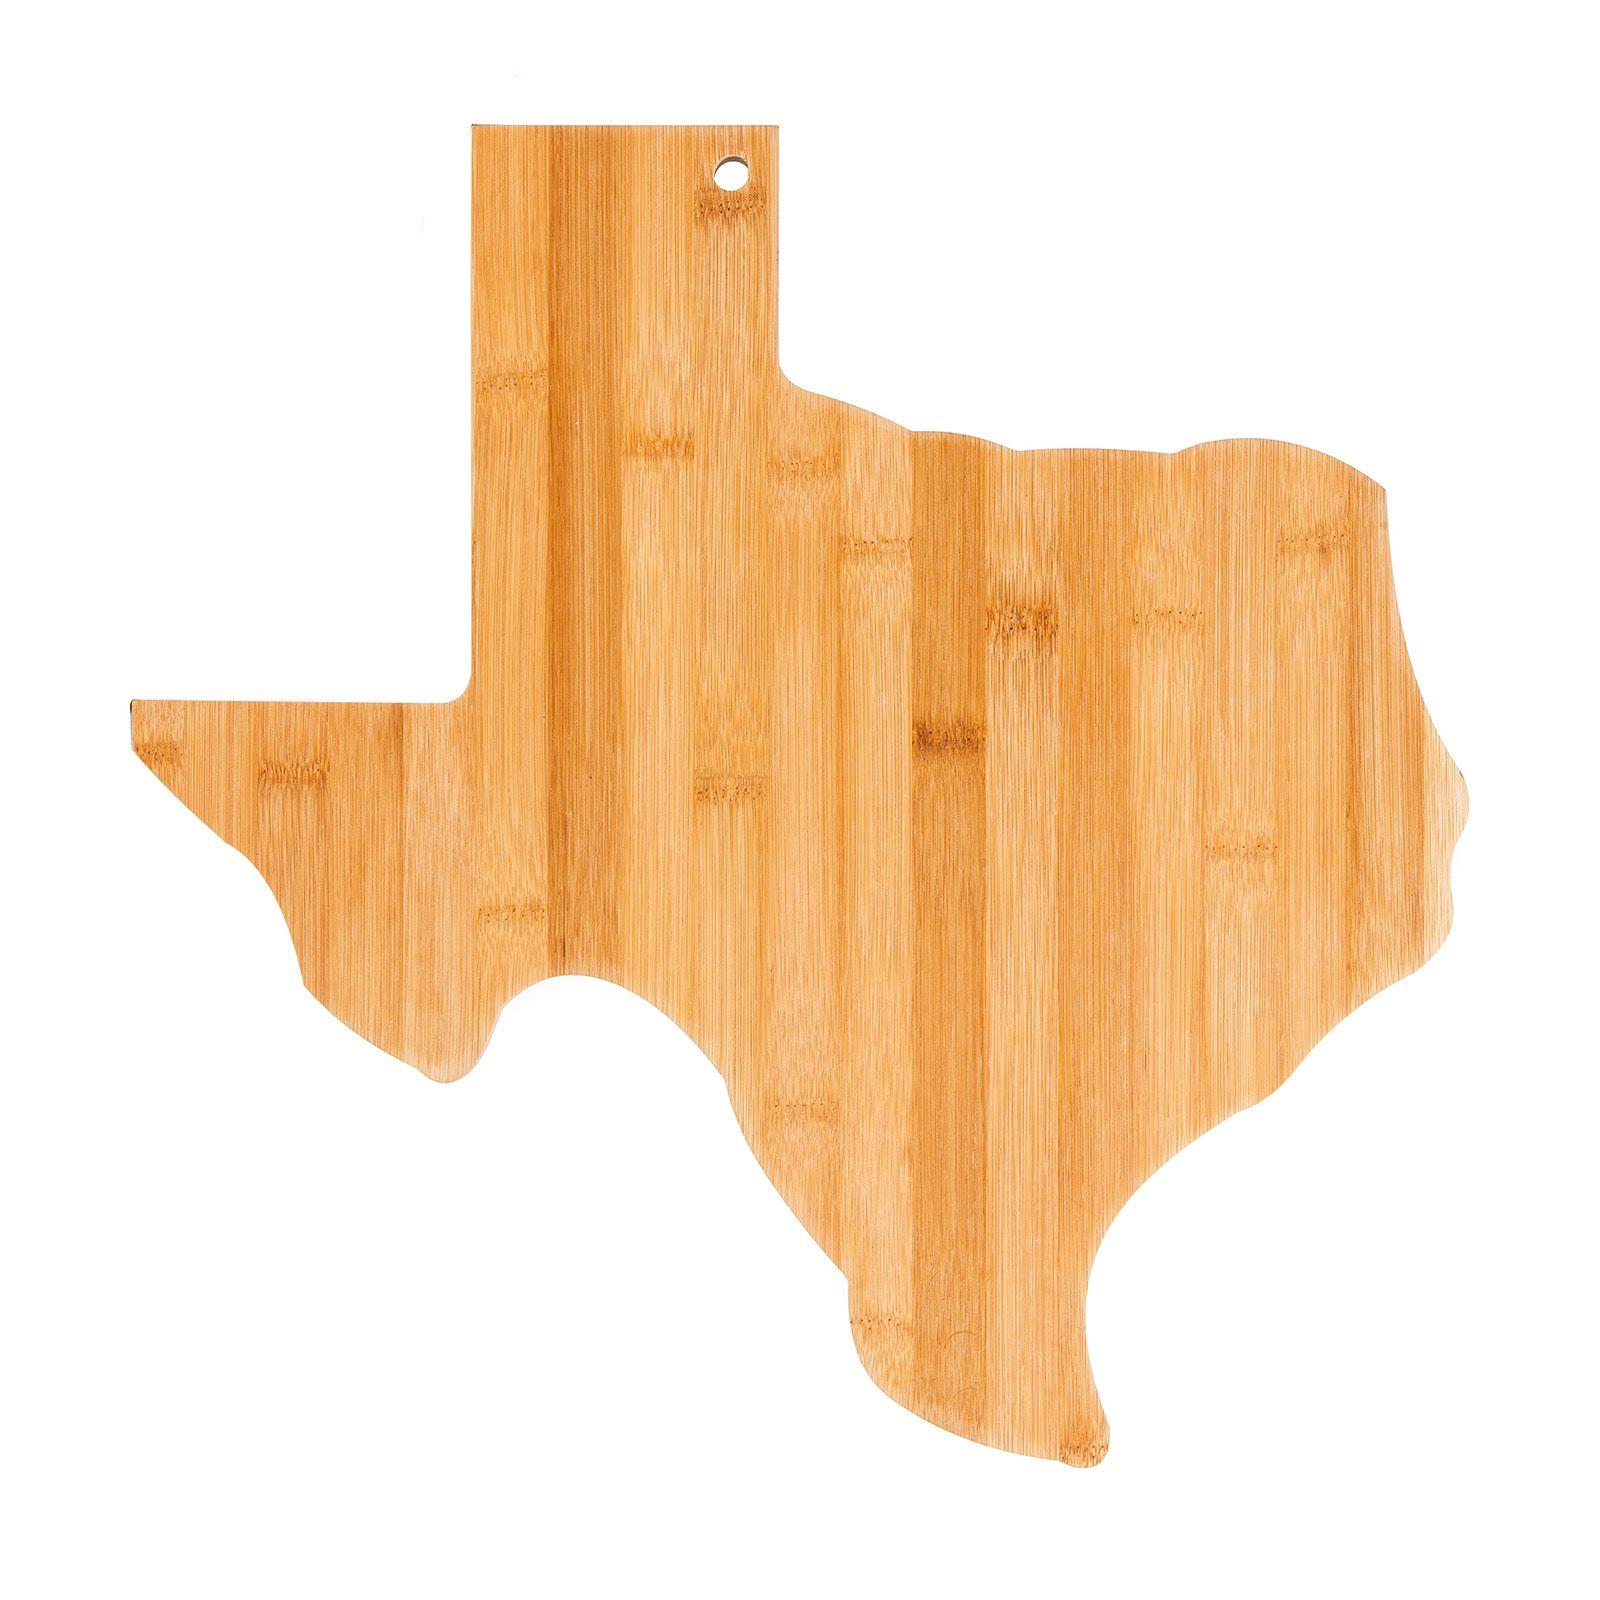 Texas Shape Wooden Cutting Board Texas Capitol Gift Shop